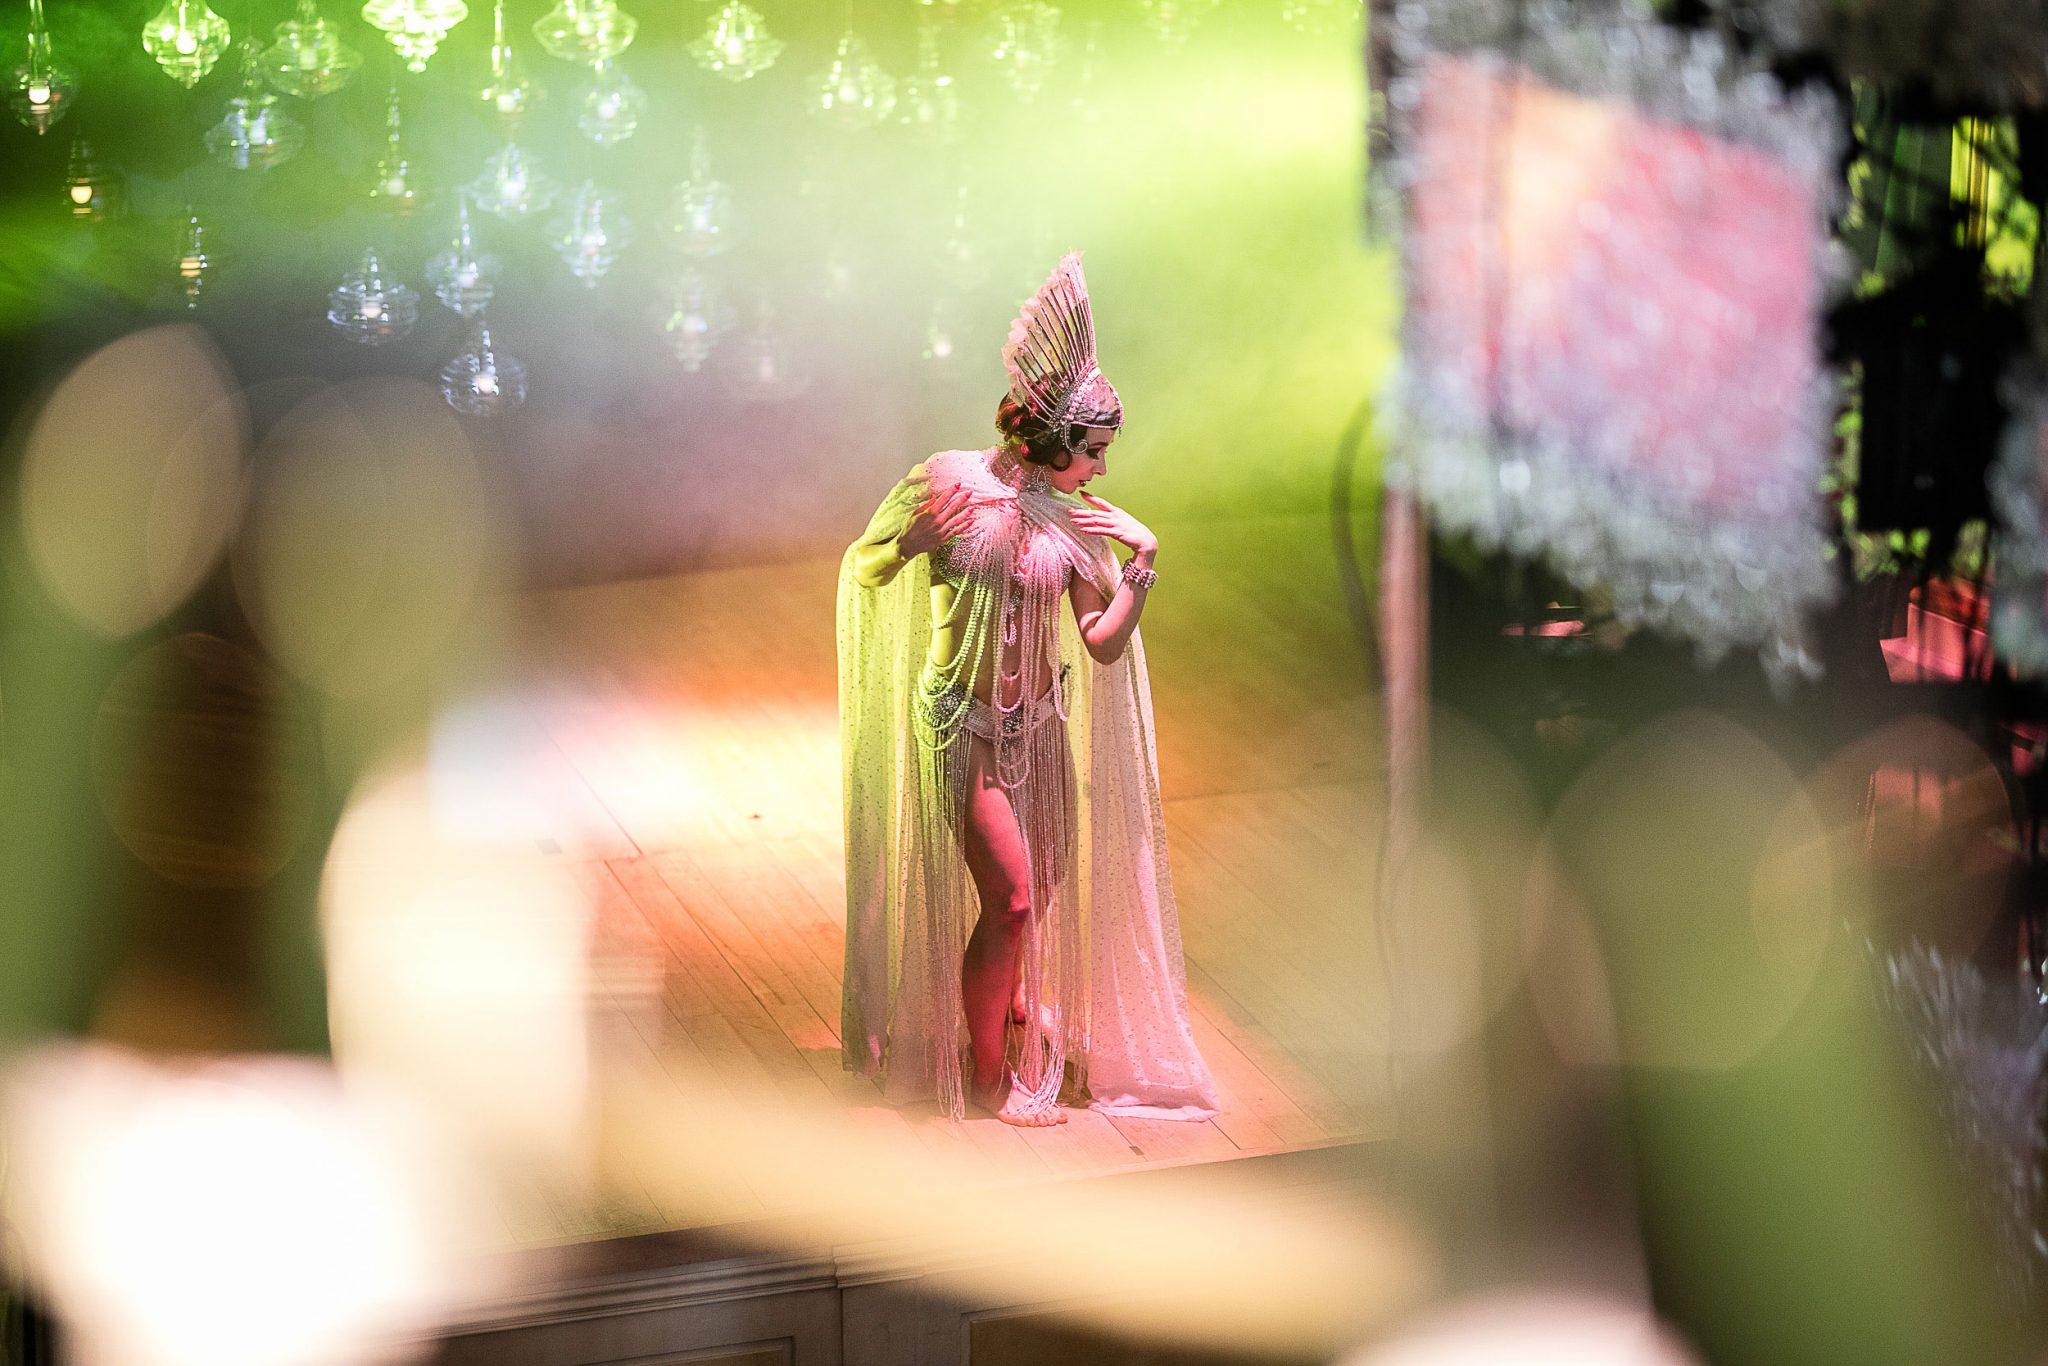 lasvit Monster Cabaret, A Phantasmagorical Show by Lasvit p6 lasvit monster cabaret milan teatro gerolamo yatzer